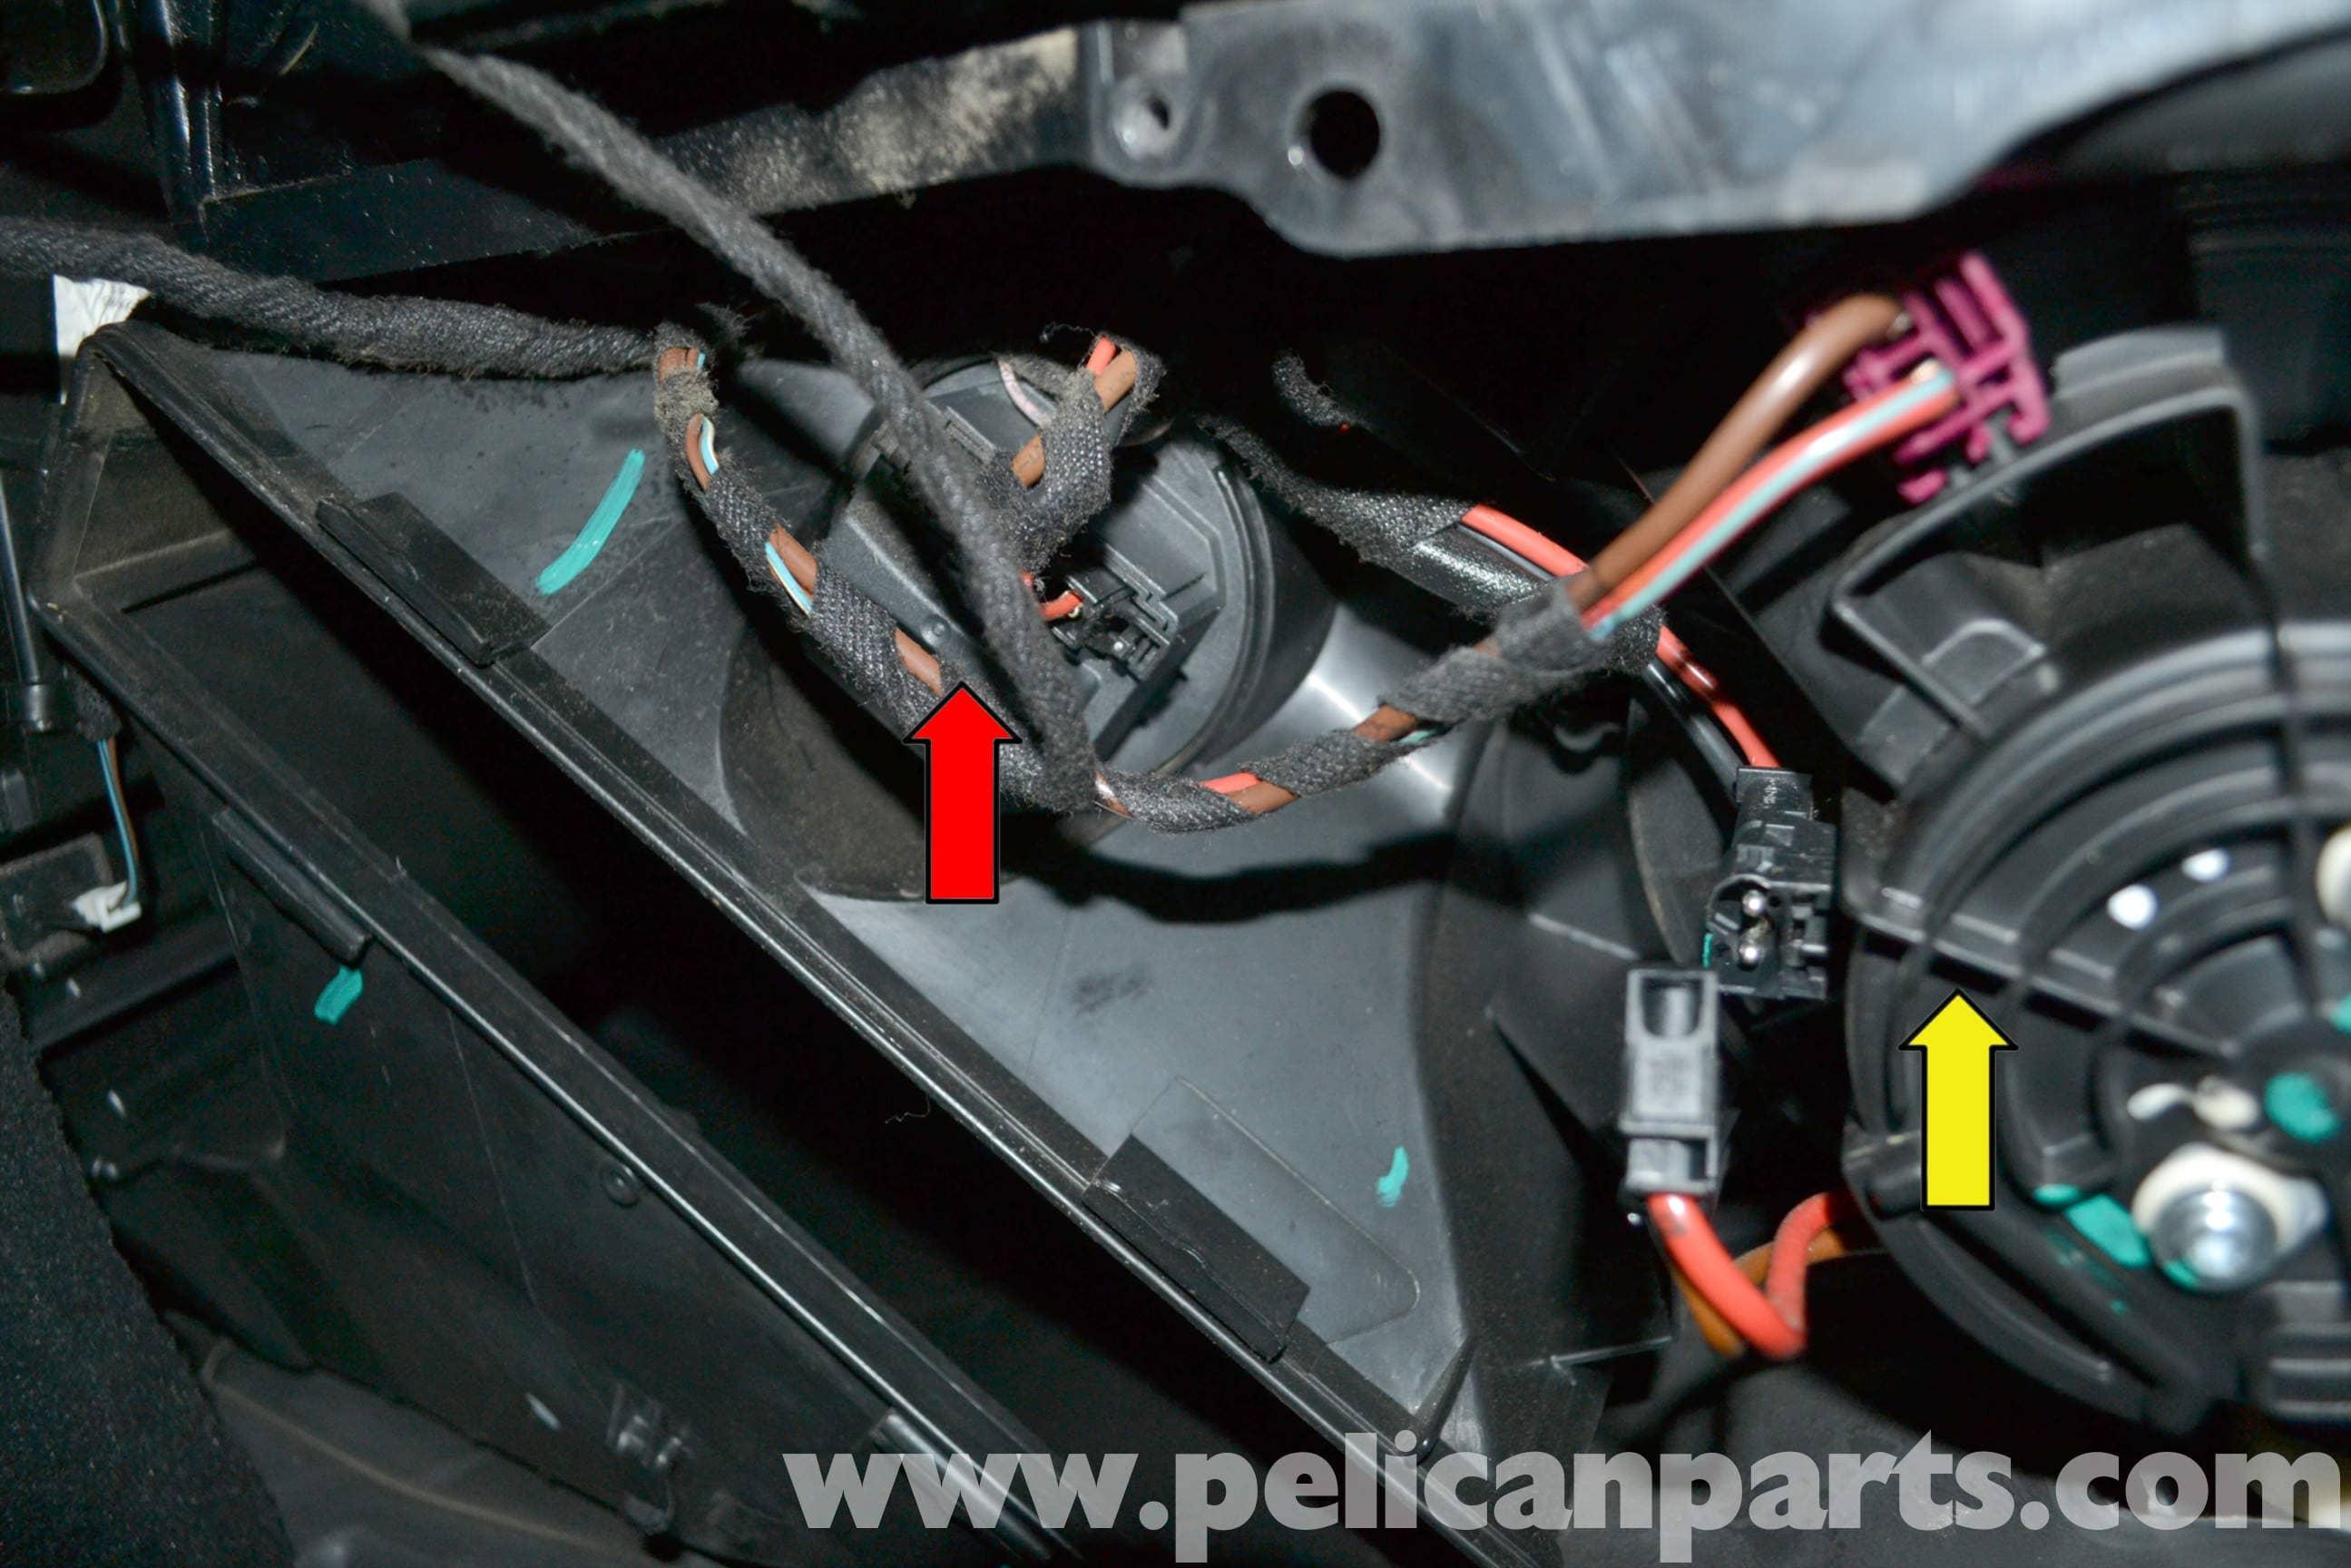 2008 E350 Wiring Diagram Mercedes Benz W204 Blower Motor Resistor Replacement